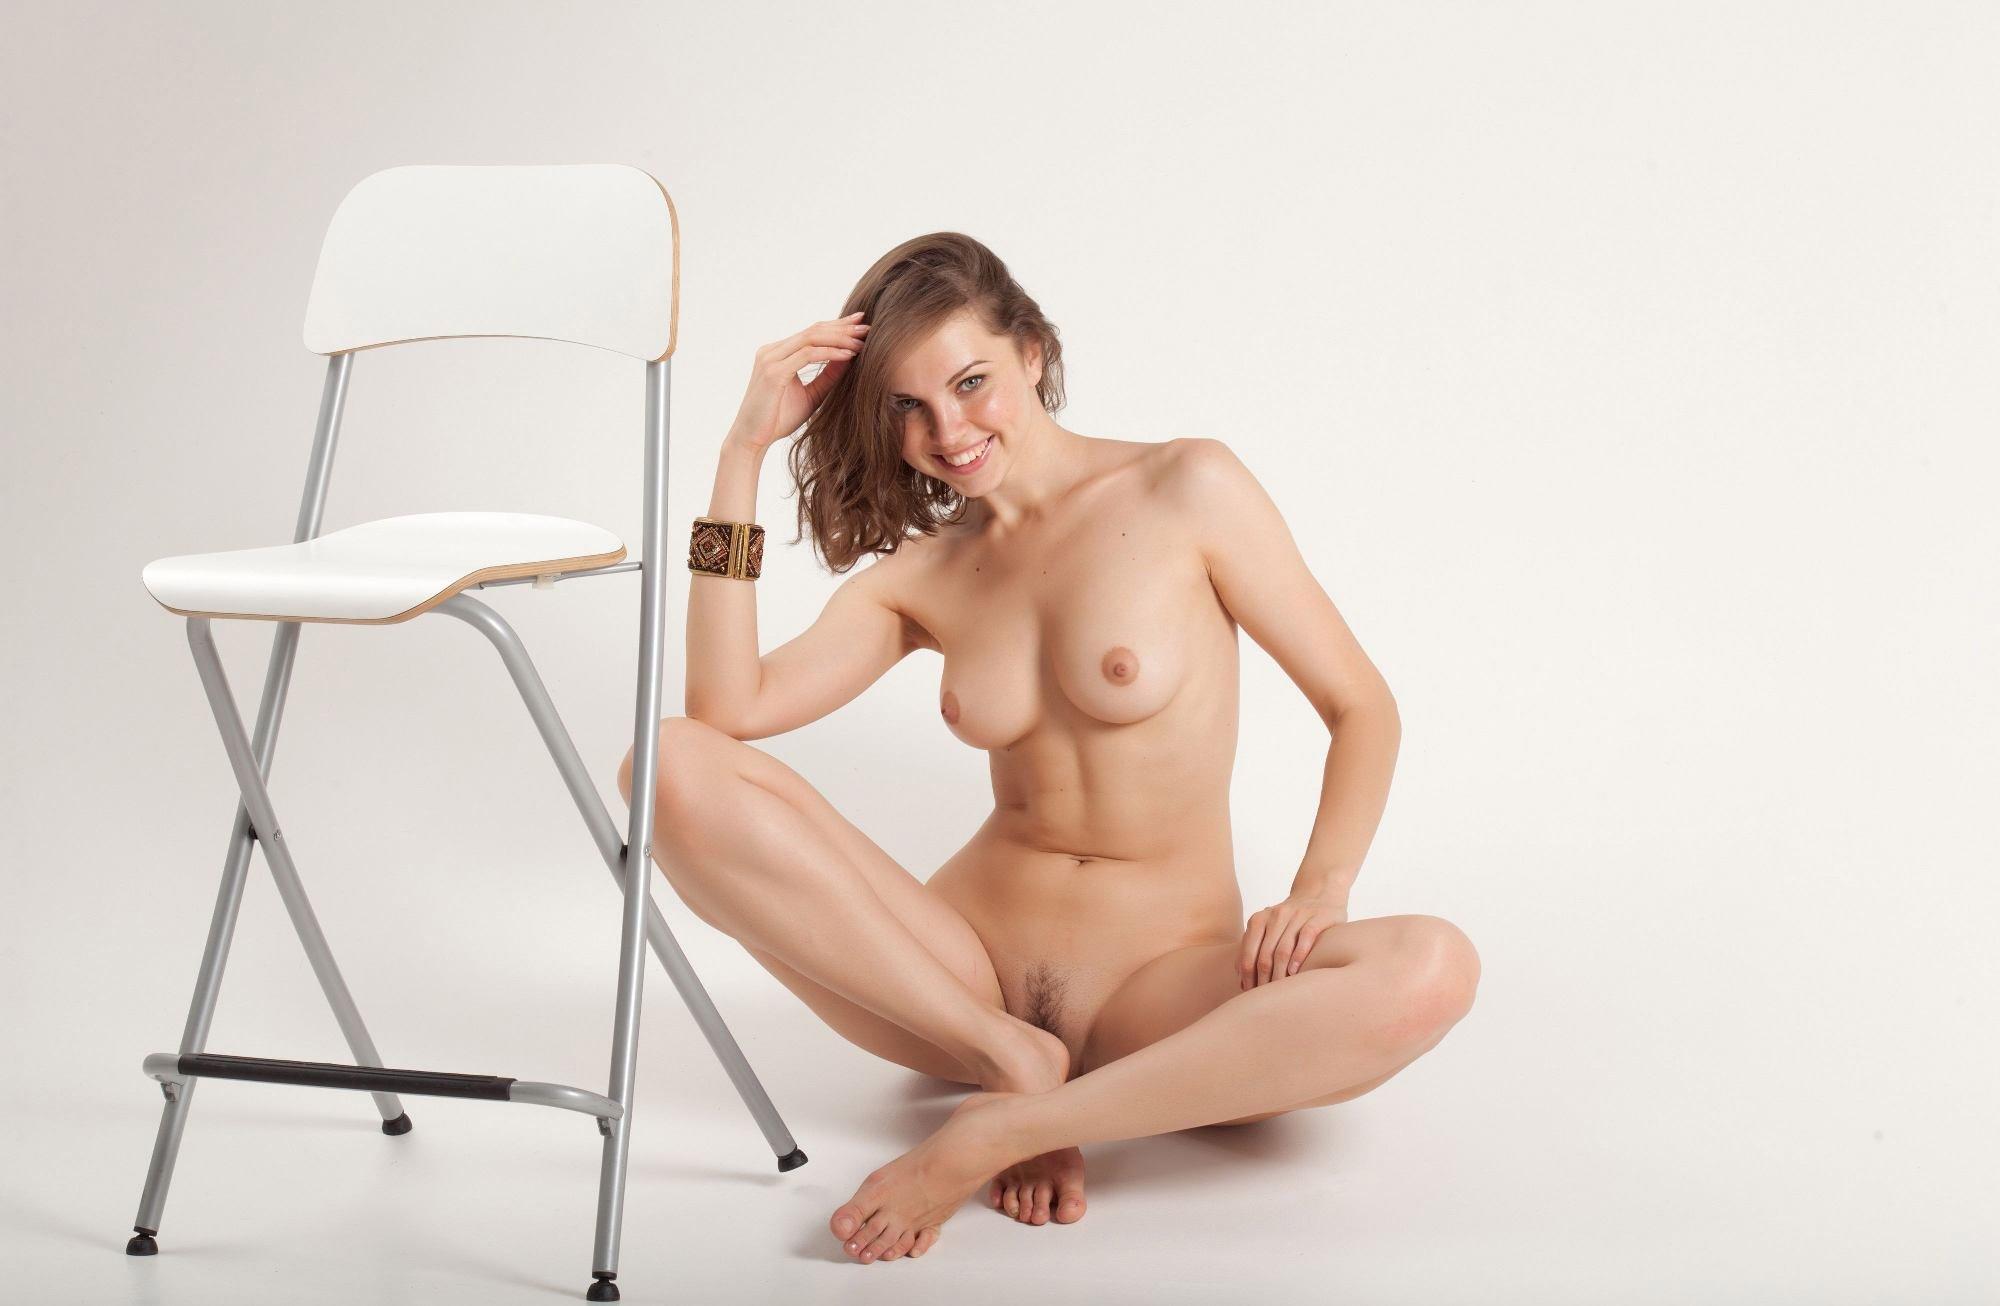 Студийная съемка эротика 8 фотография